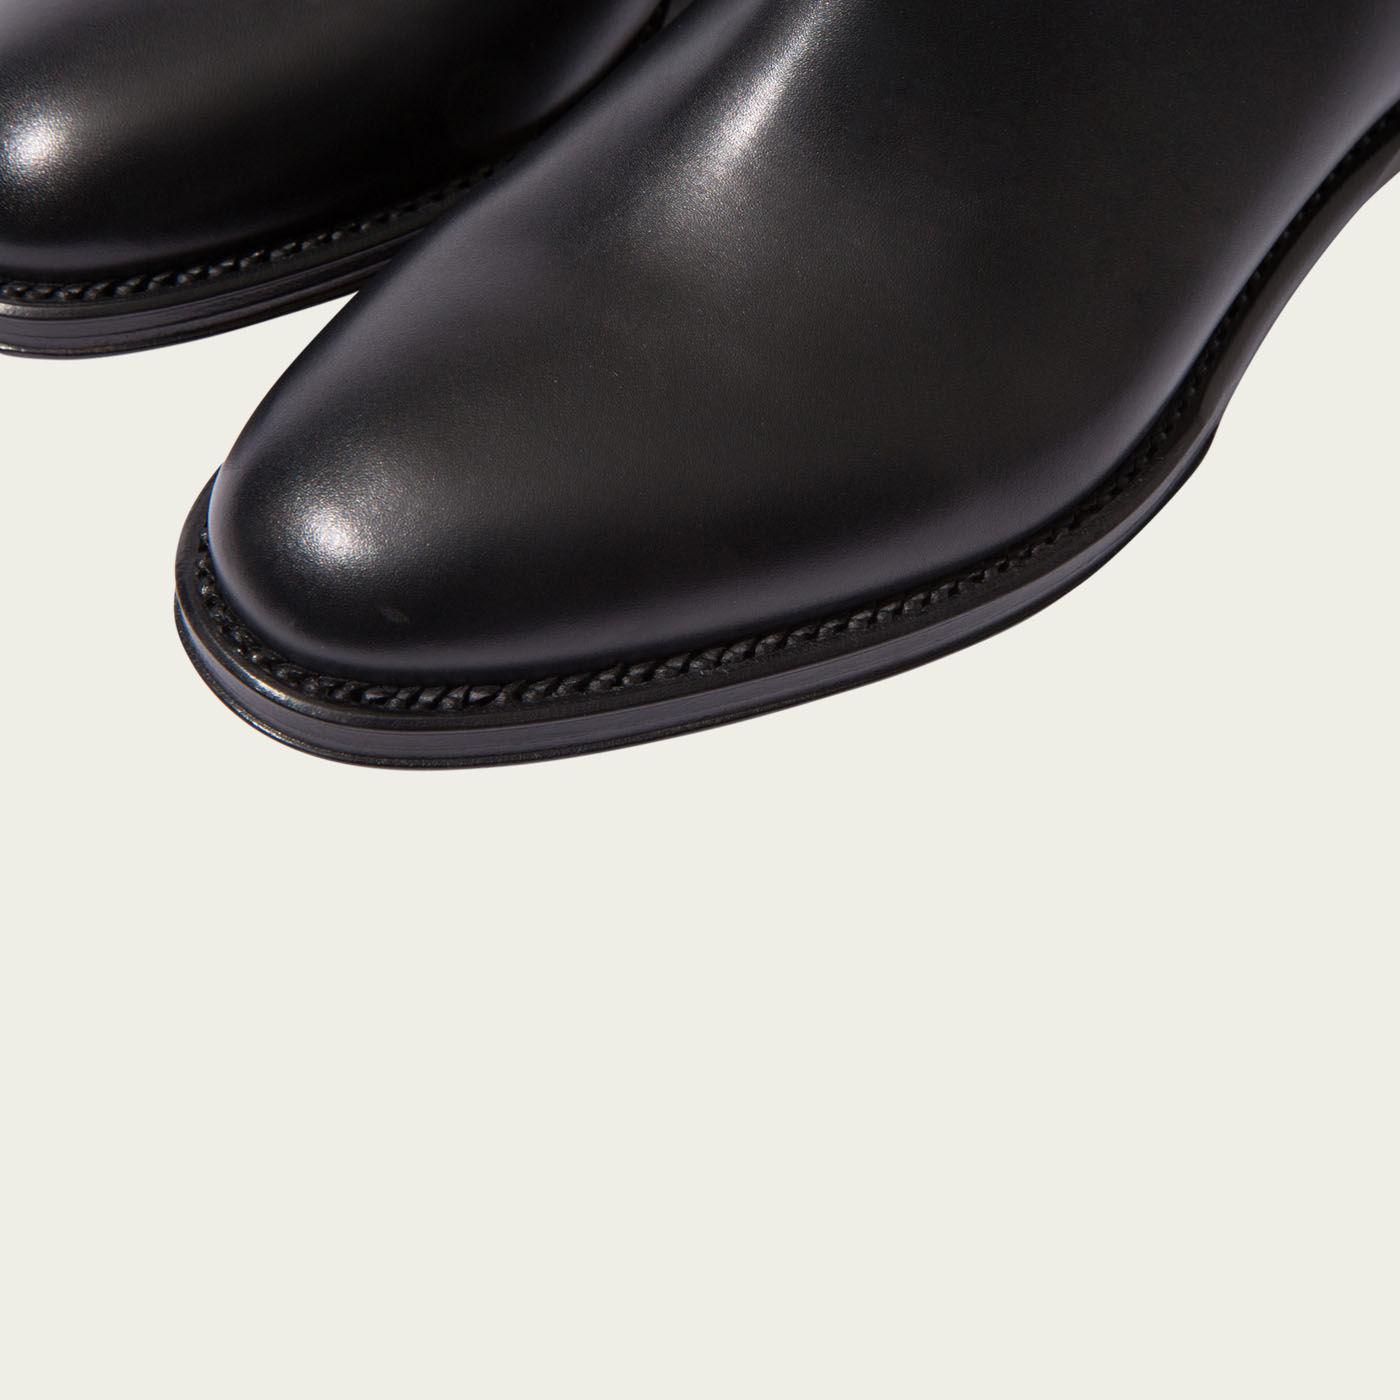 Cooper Black Chelsea Boots | Bombinate